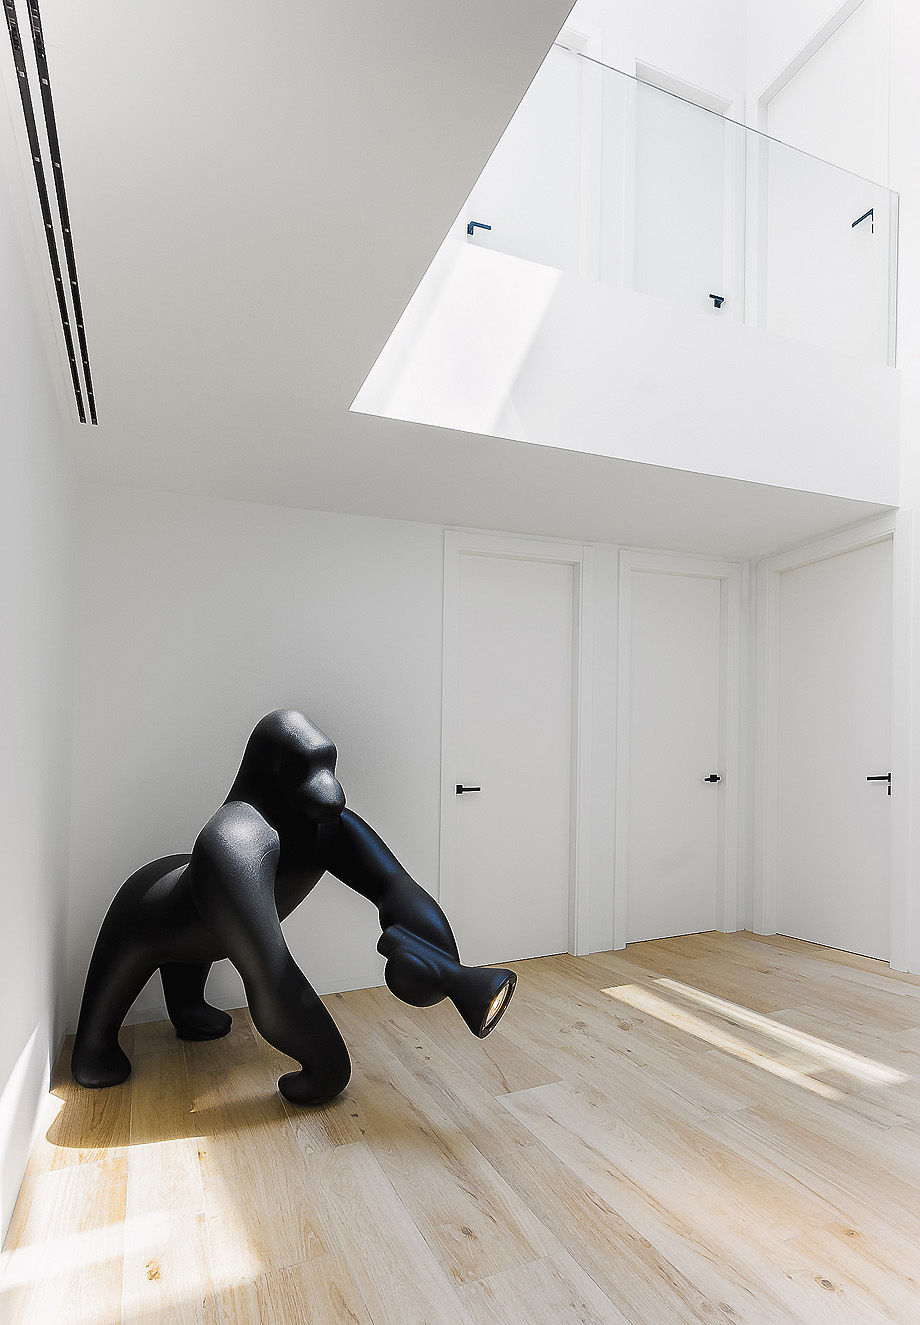 calaiaia de chiralt arquitectos - foto eva perez (11)